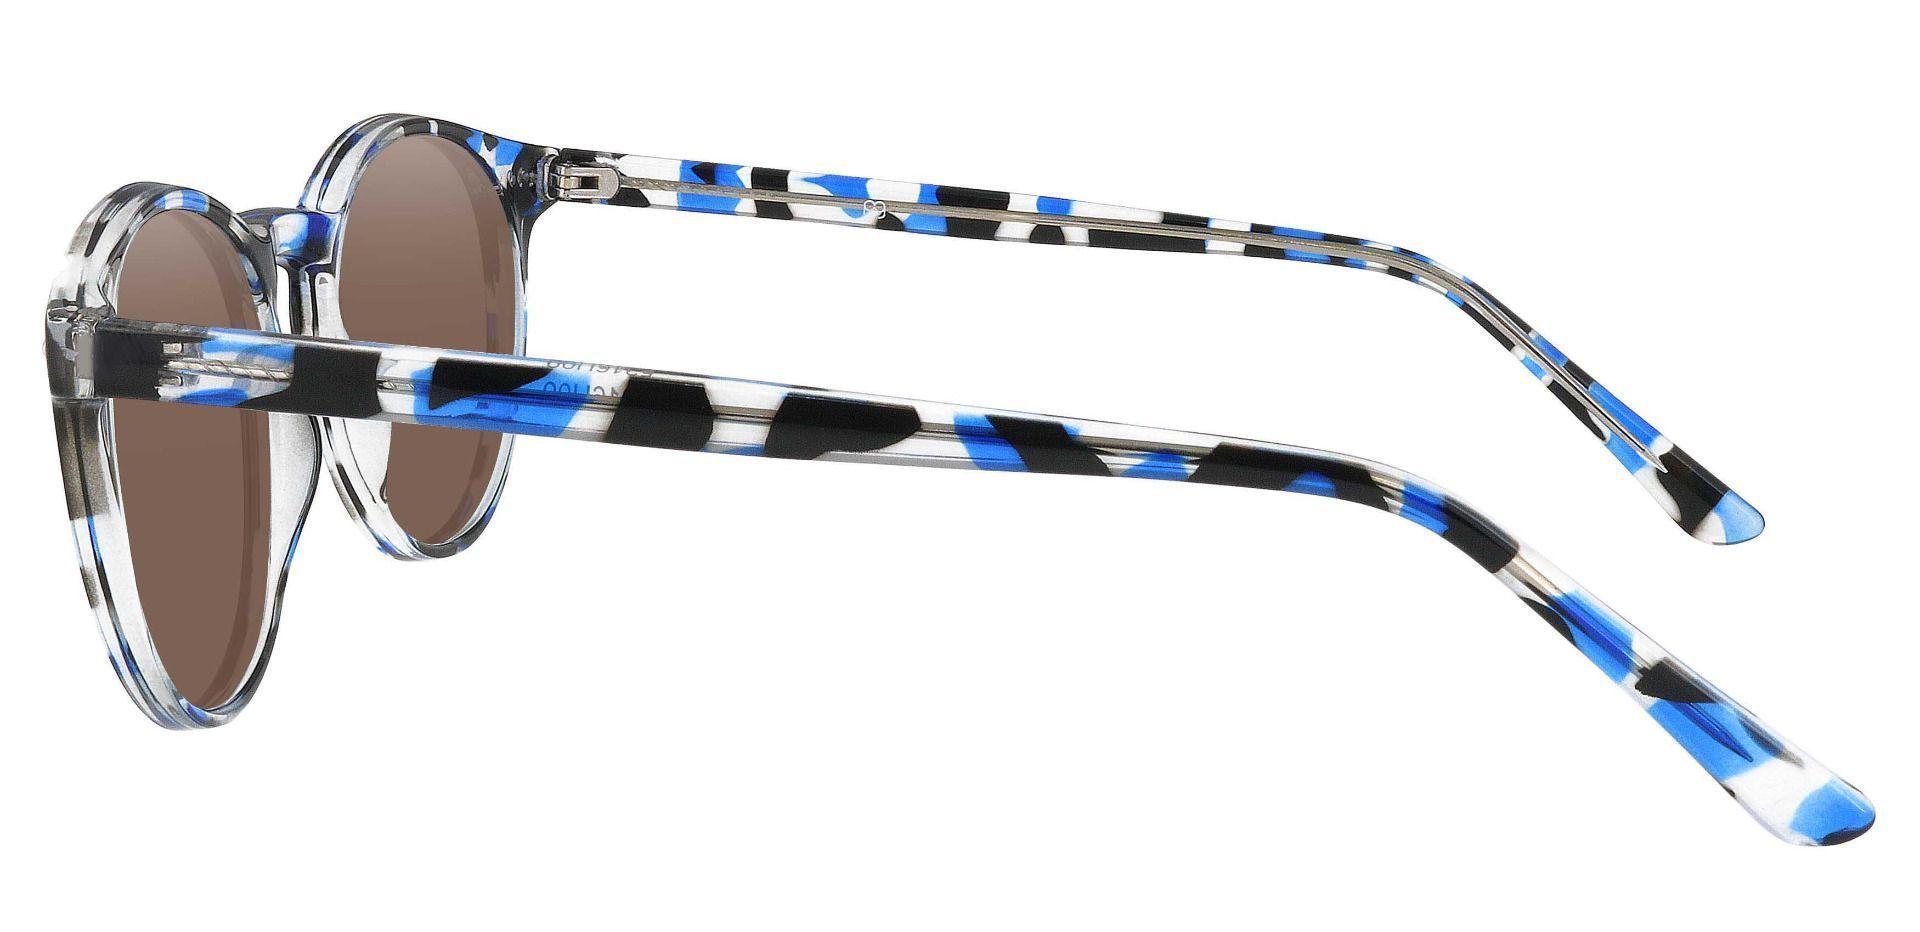 Dormont Round Prescription Sunglasses - Blue Frame With Brown Lenses